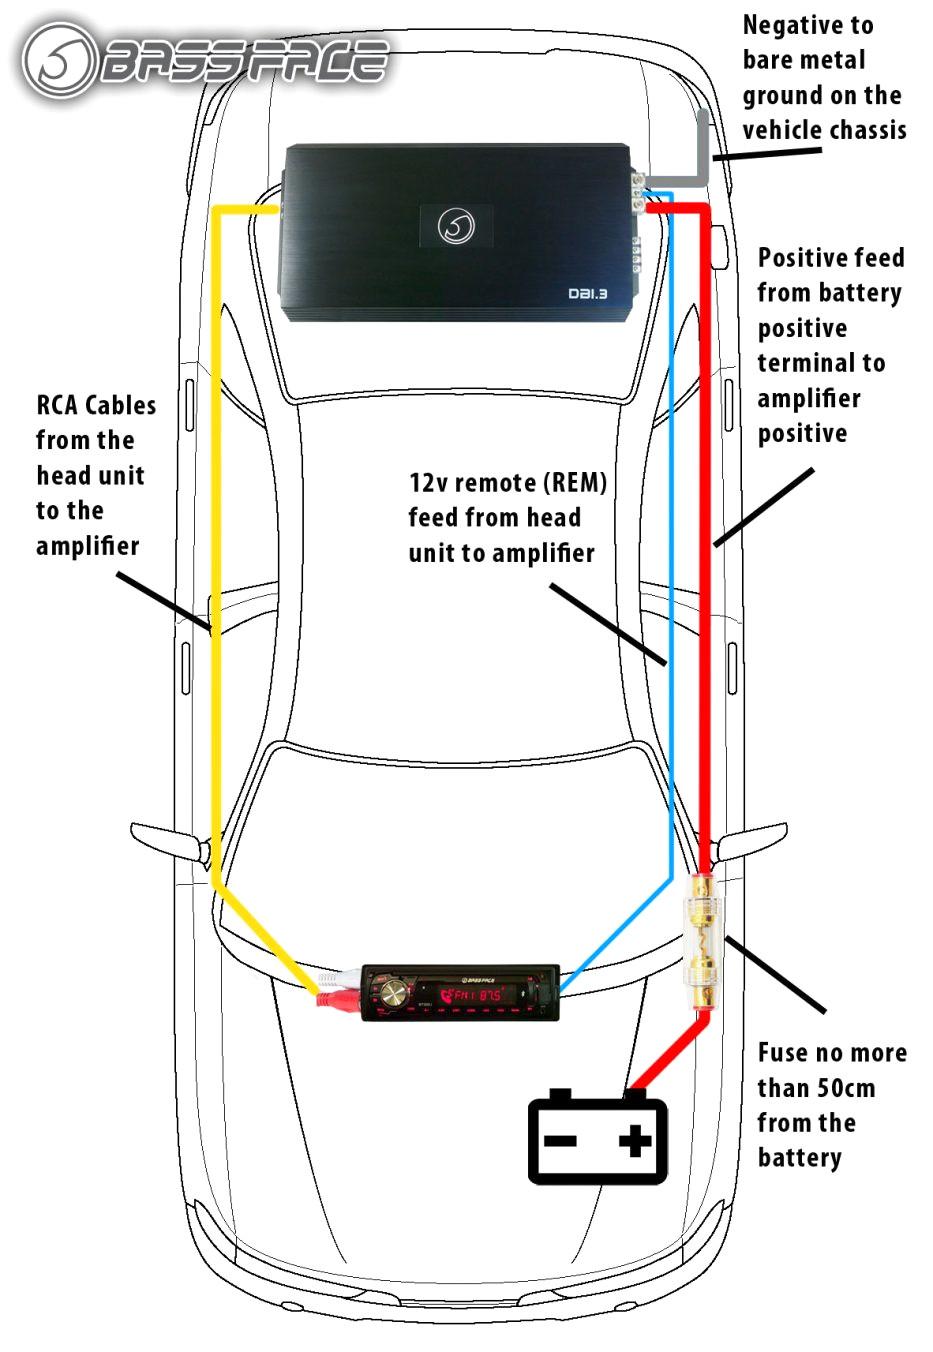 subwoofer amp wiring diagram tb 3348  sony subwoofer wiring diagram on power acoustik radio  tb 3348  sony subwoofer wiring diagram